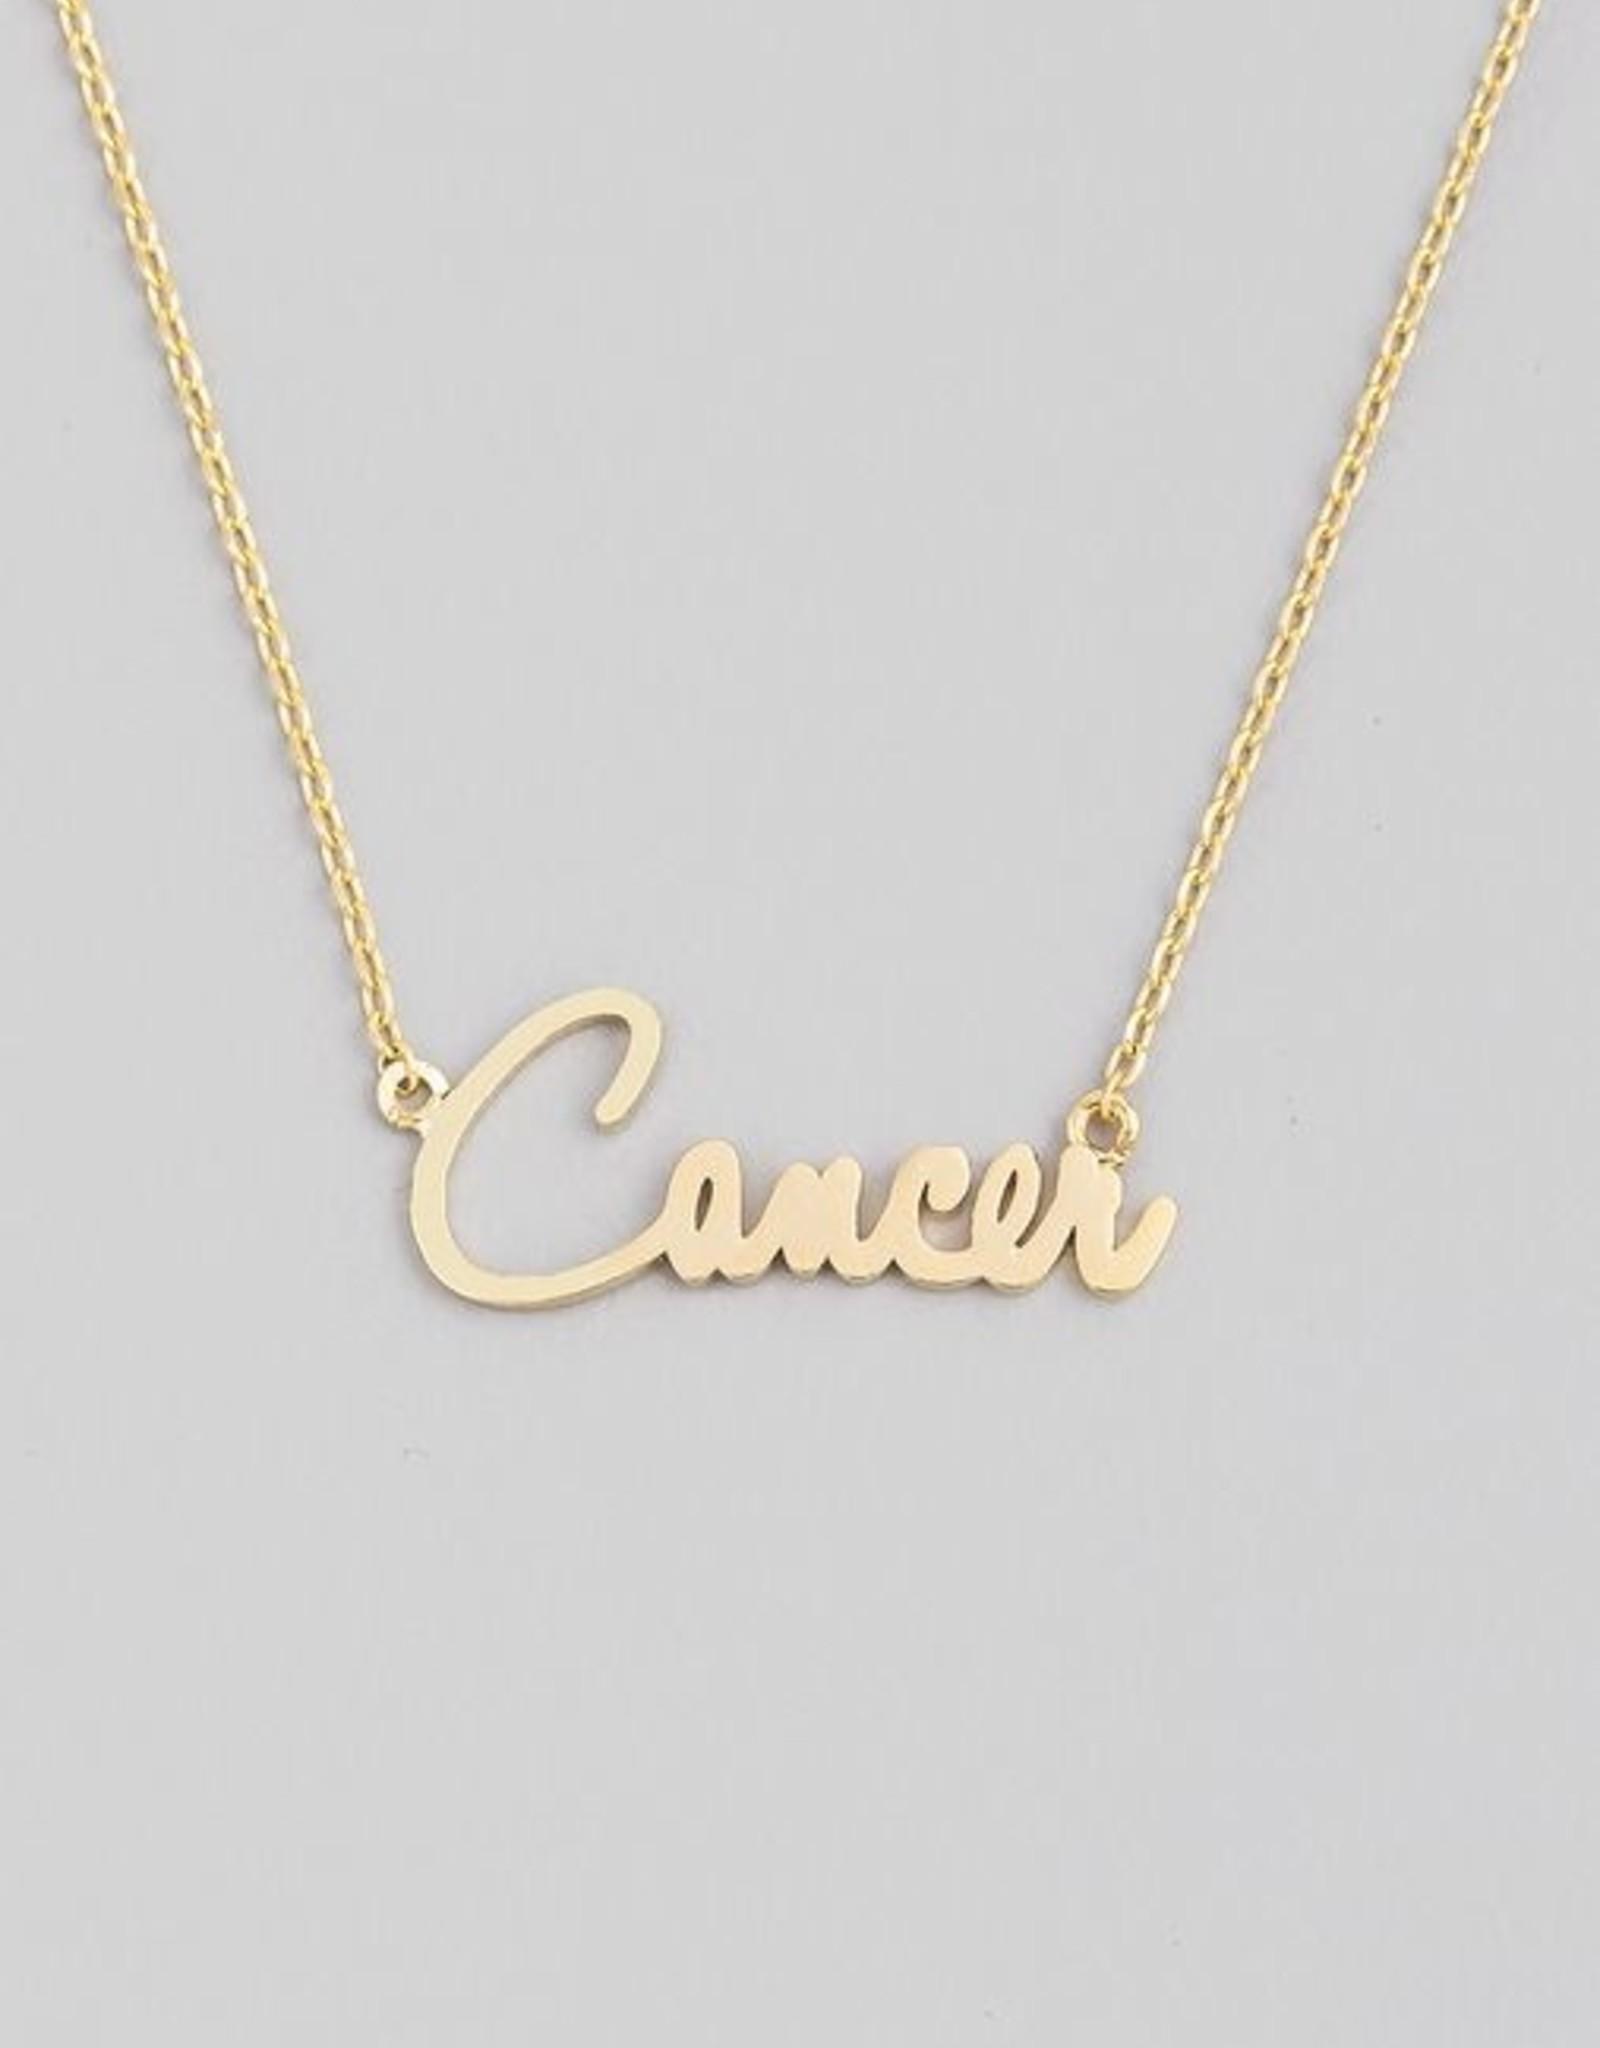 Fame Accessories Handwritten Zodiac Necklace - Cancer